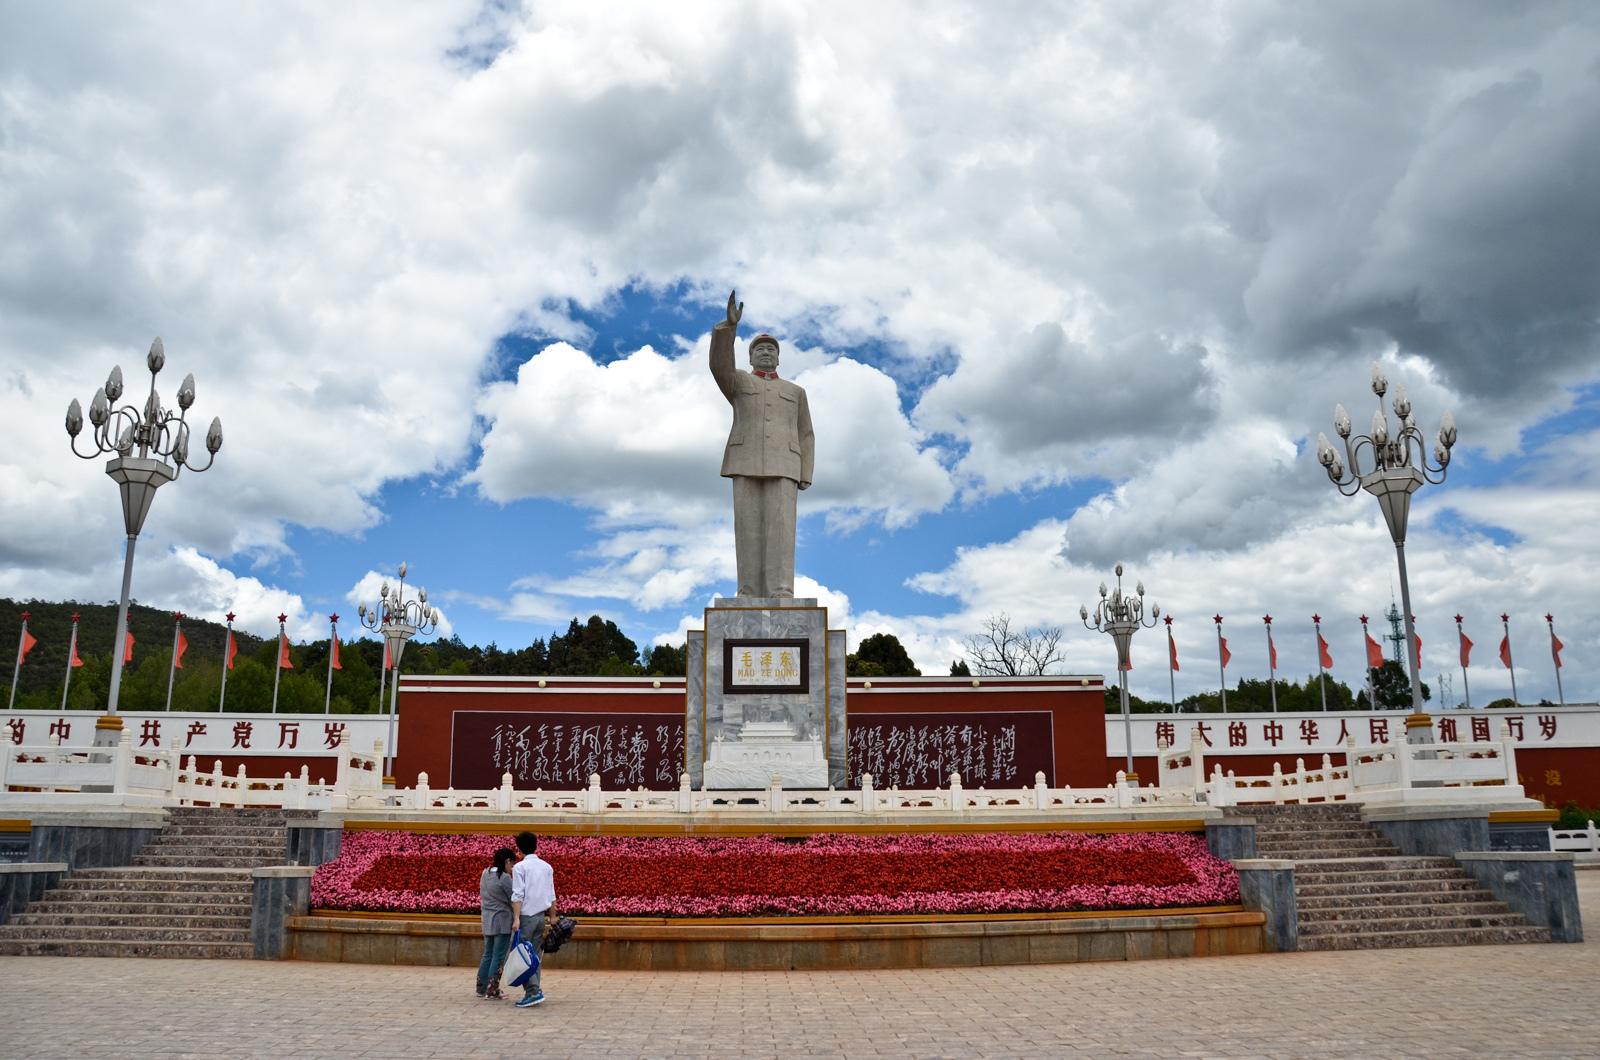 Statue de Mao Zedong, Lijiang